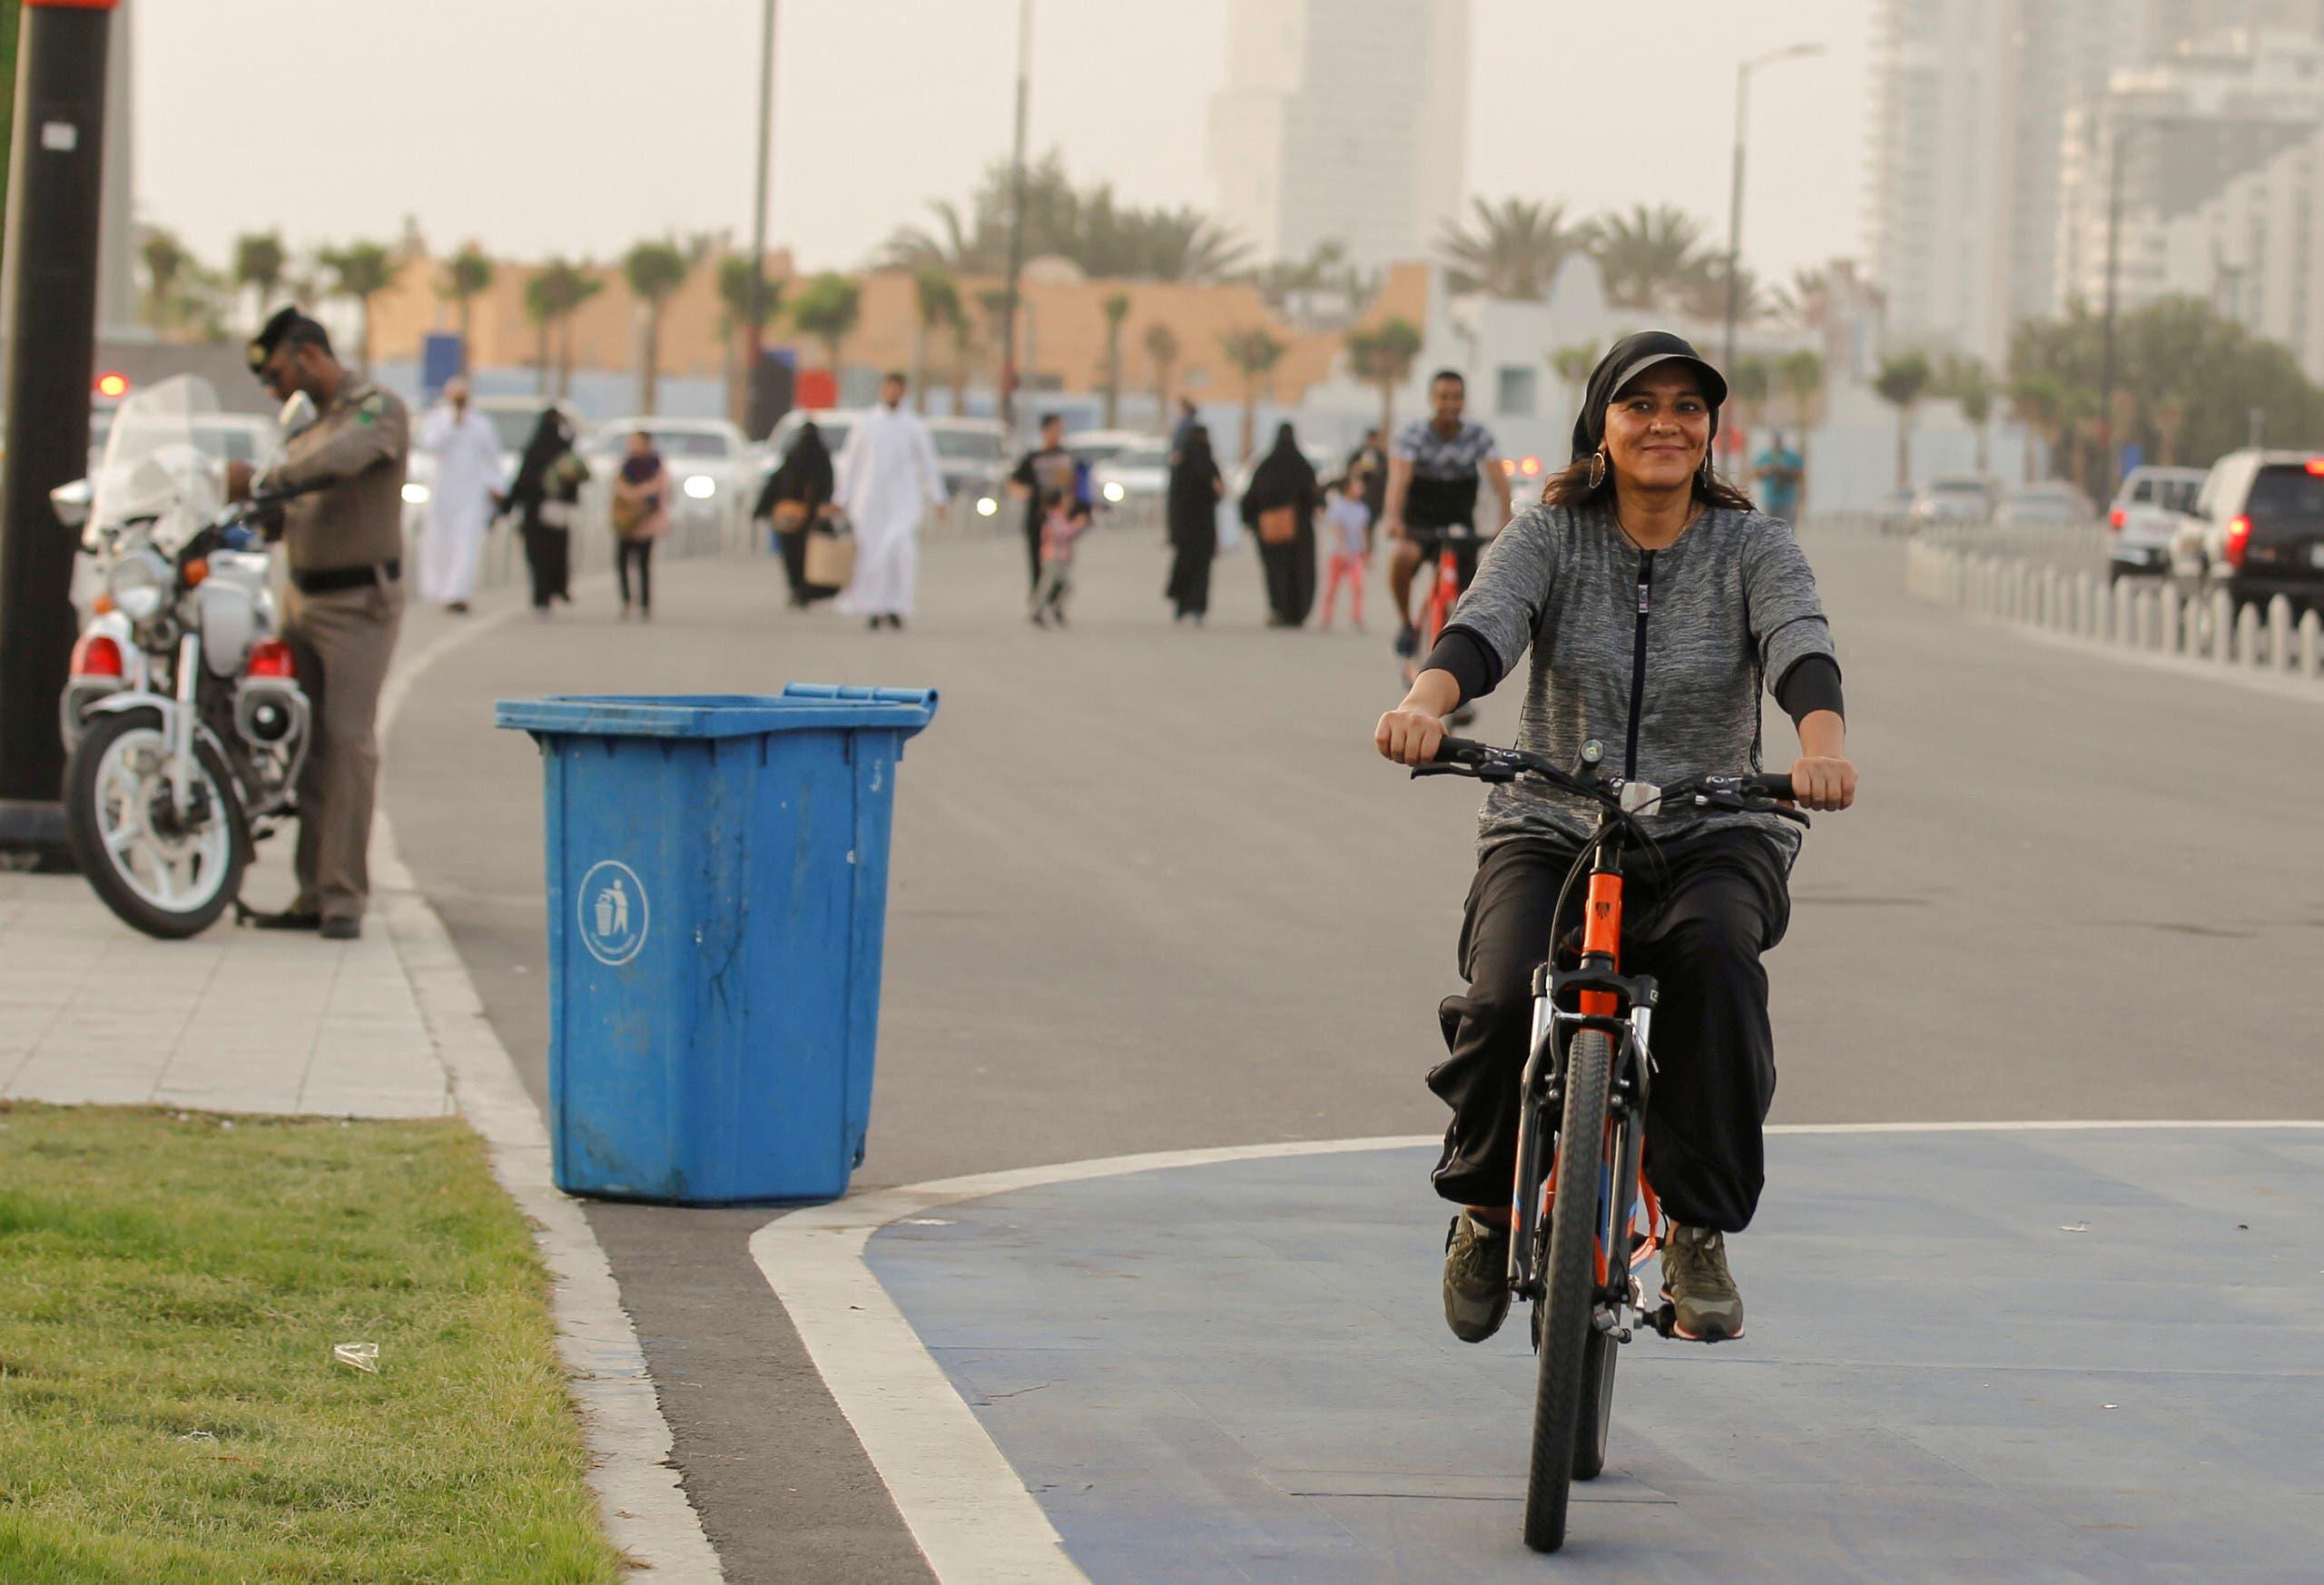 saudi eman joharjy 1 (Reuters)